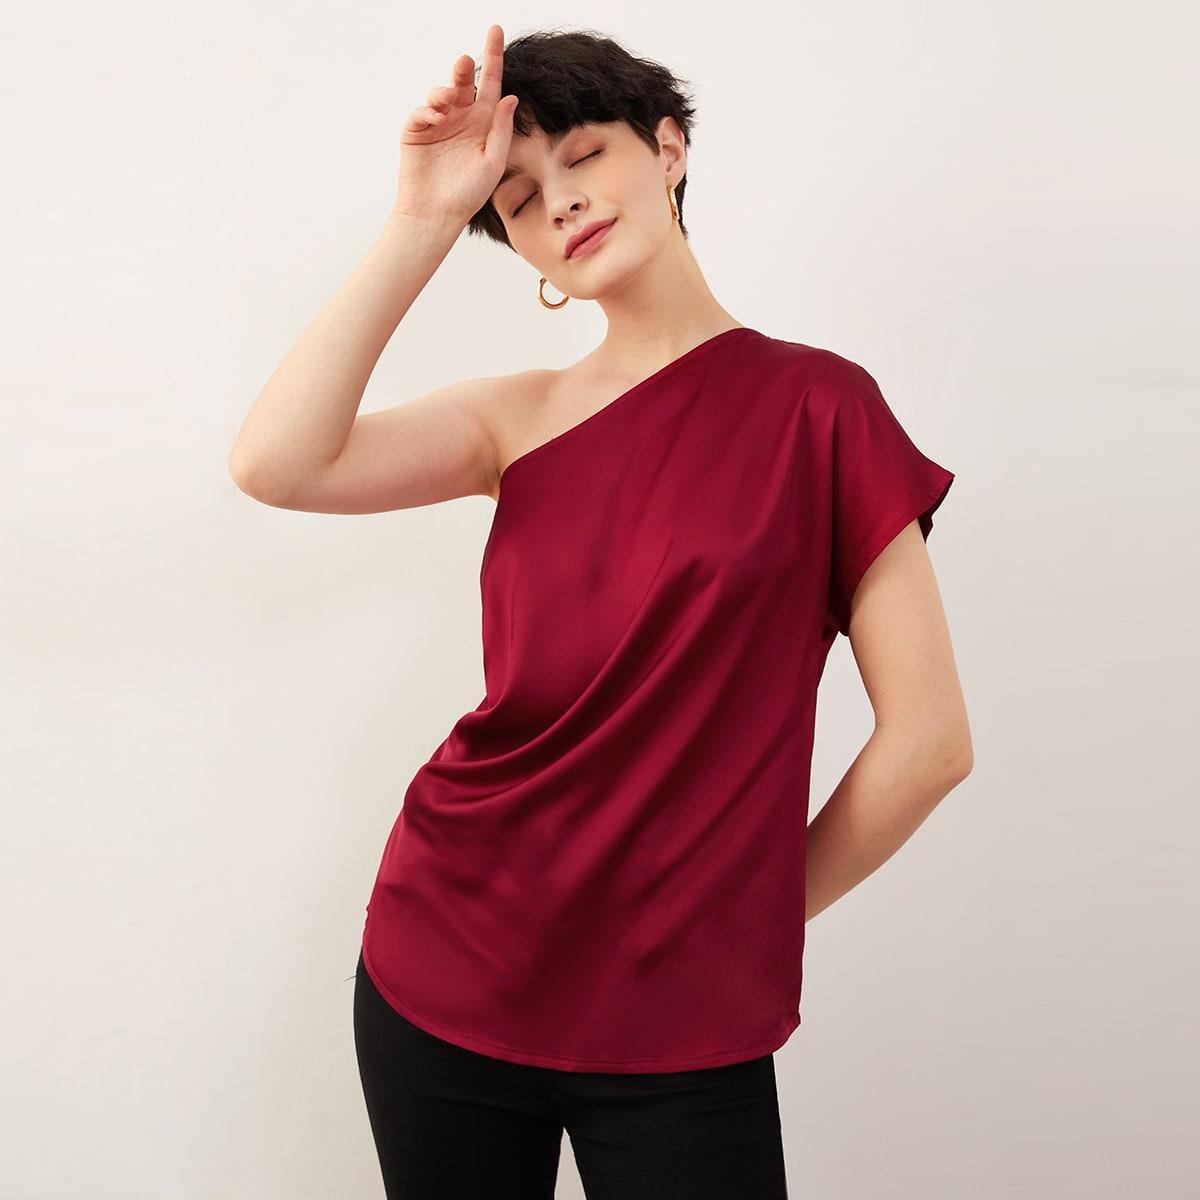 Атласная блузка на одно плечо со складкой фото